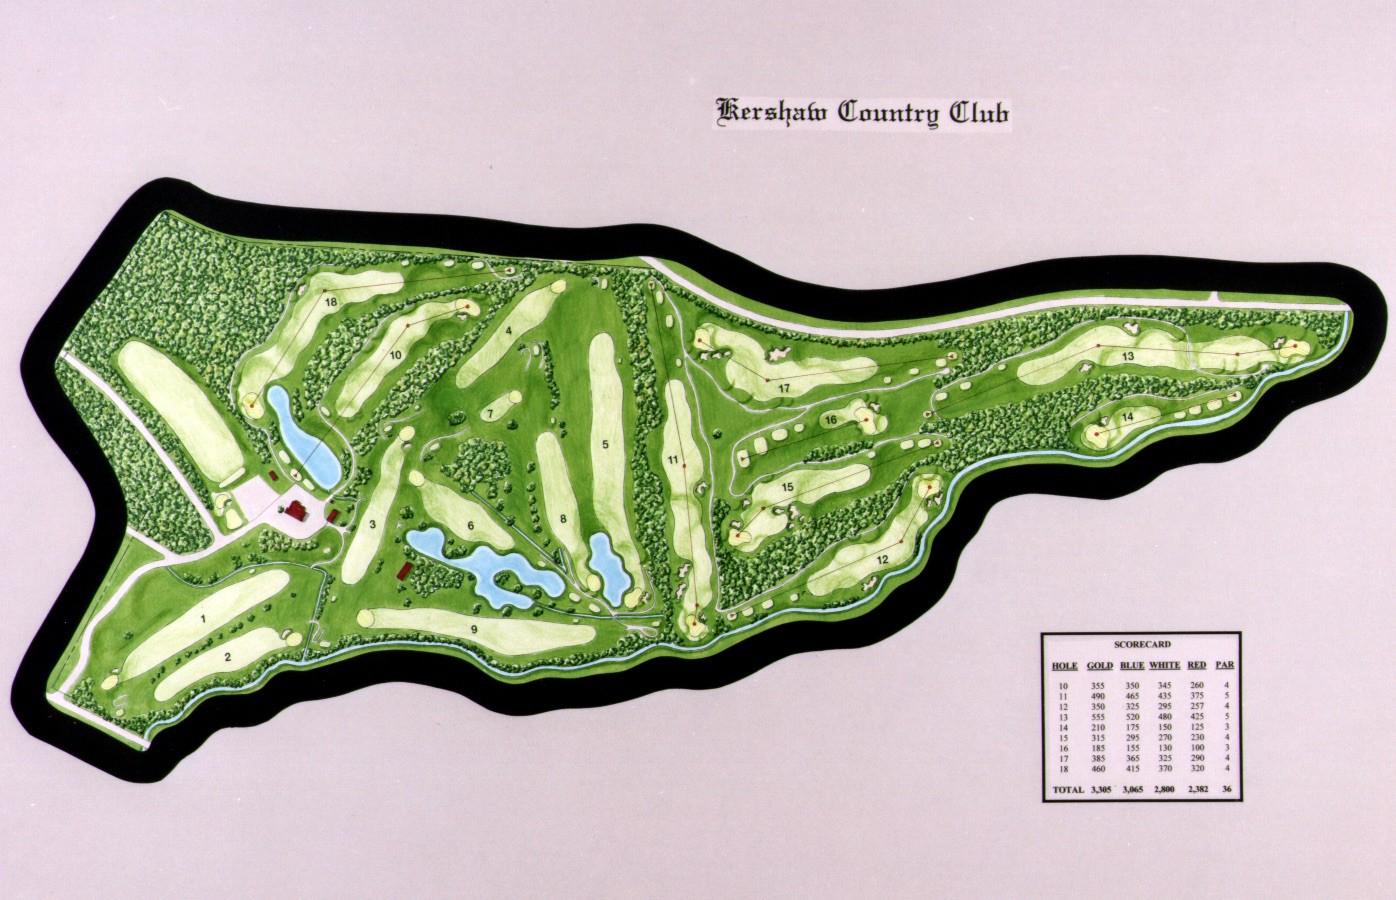 Kershaw Country Club1